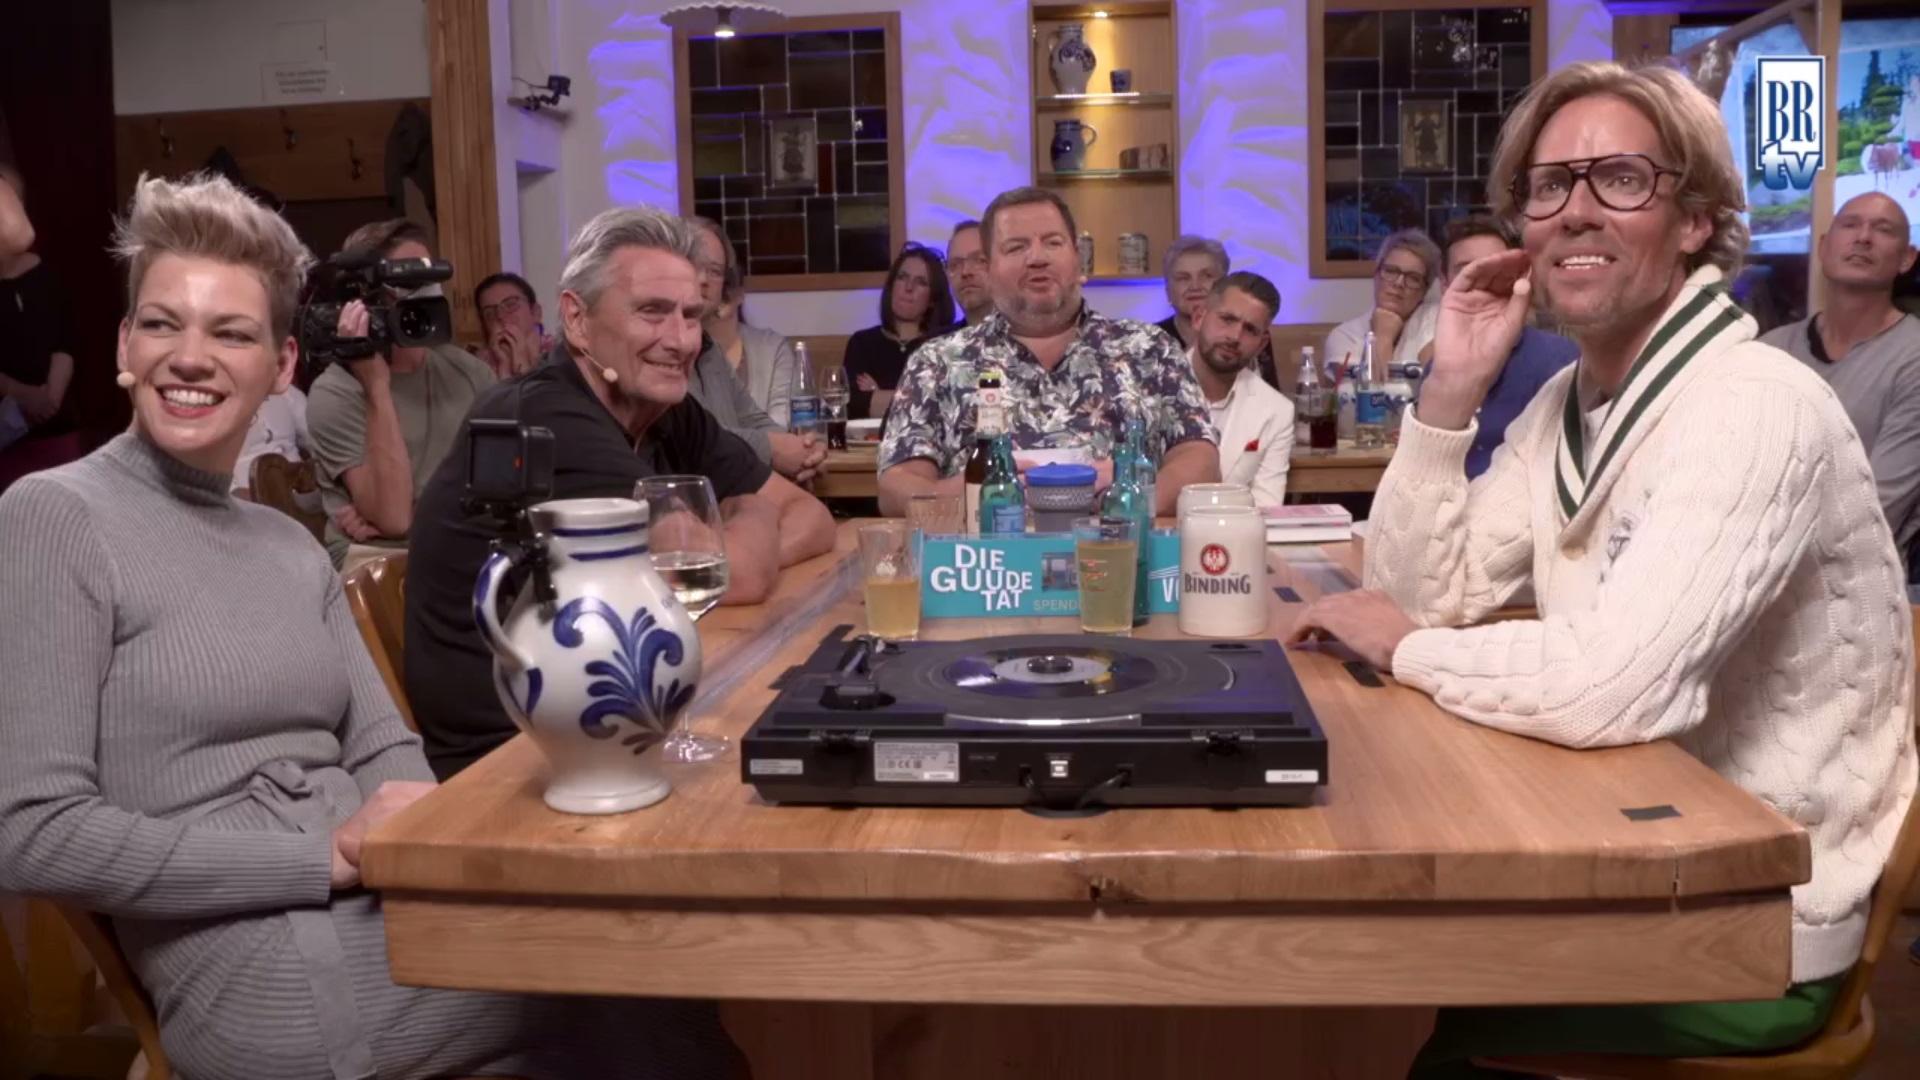 Bembel & Gebabbel – Folge 55 mit Franziska Knabenreich, Jens Hilbert & Dieter Müllerb